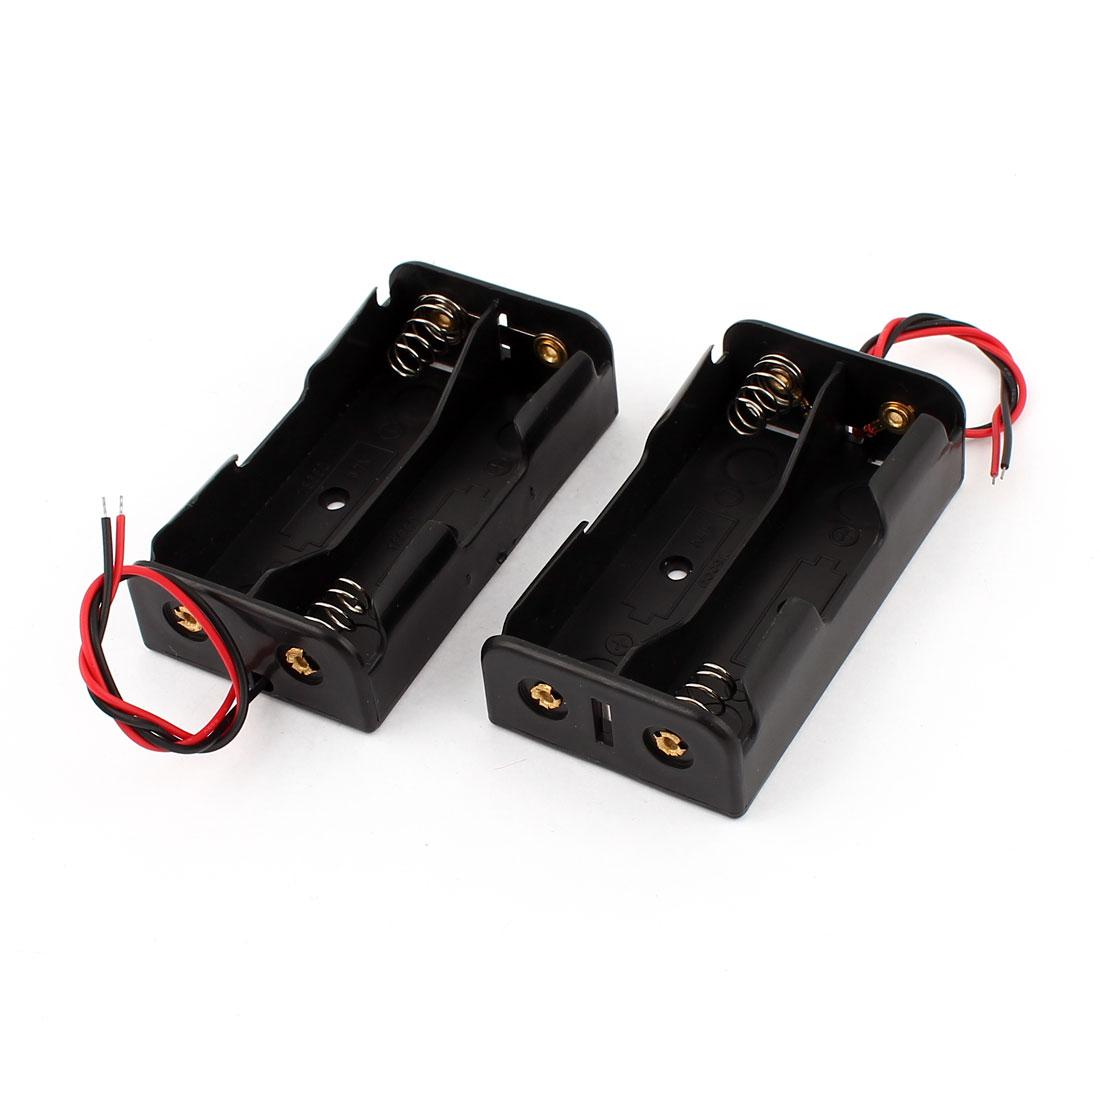 2Pcs Black 2 x 3.7V 18650 Battery Batteries Holder Case w Wire Leads